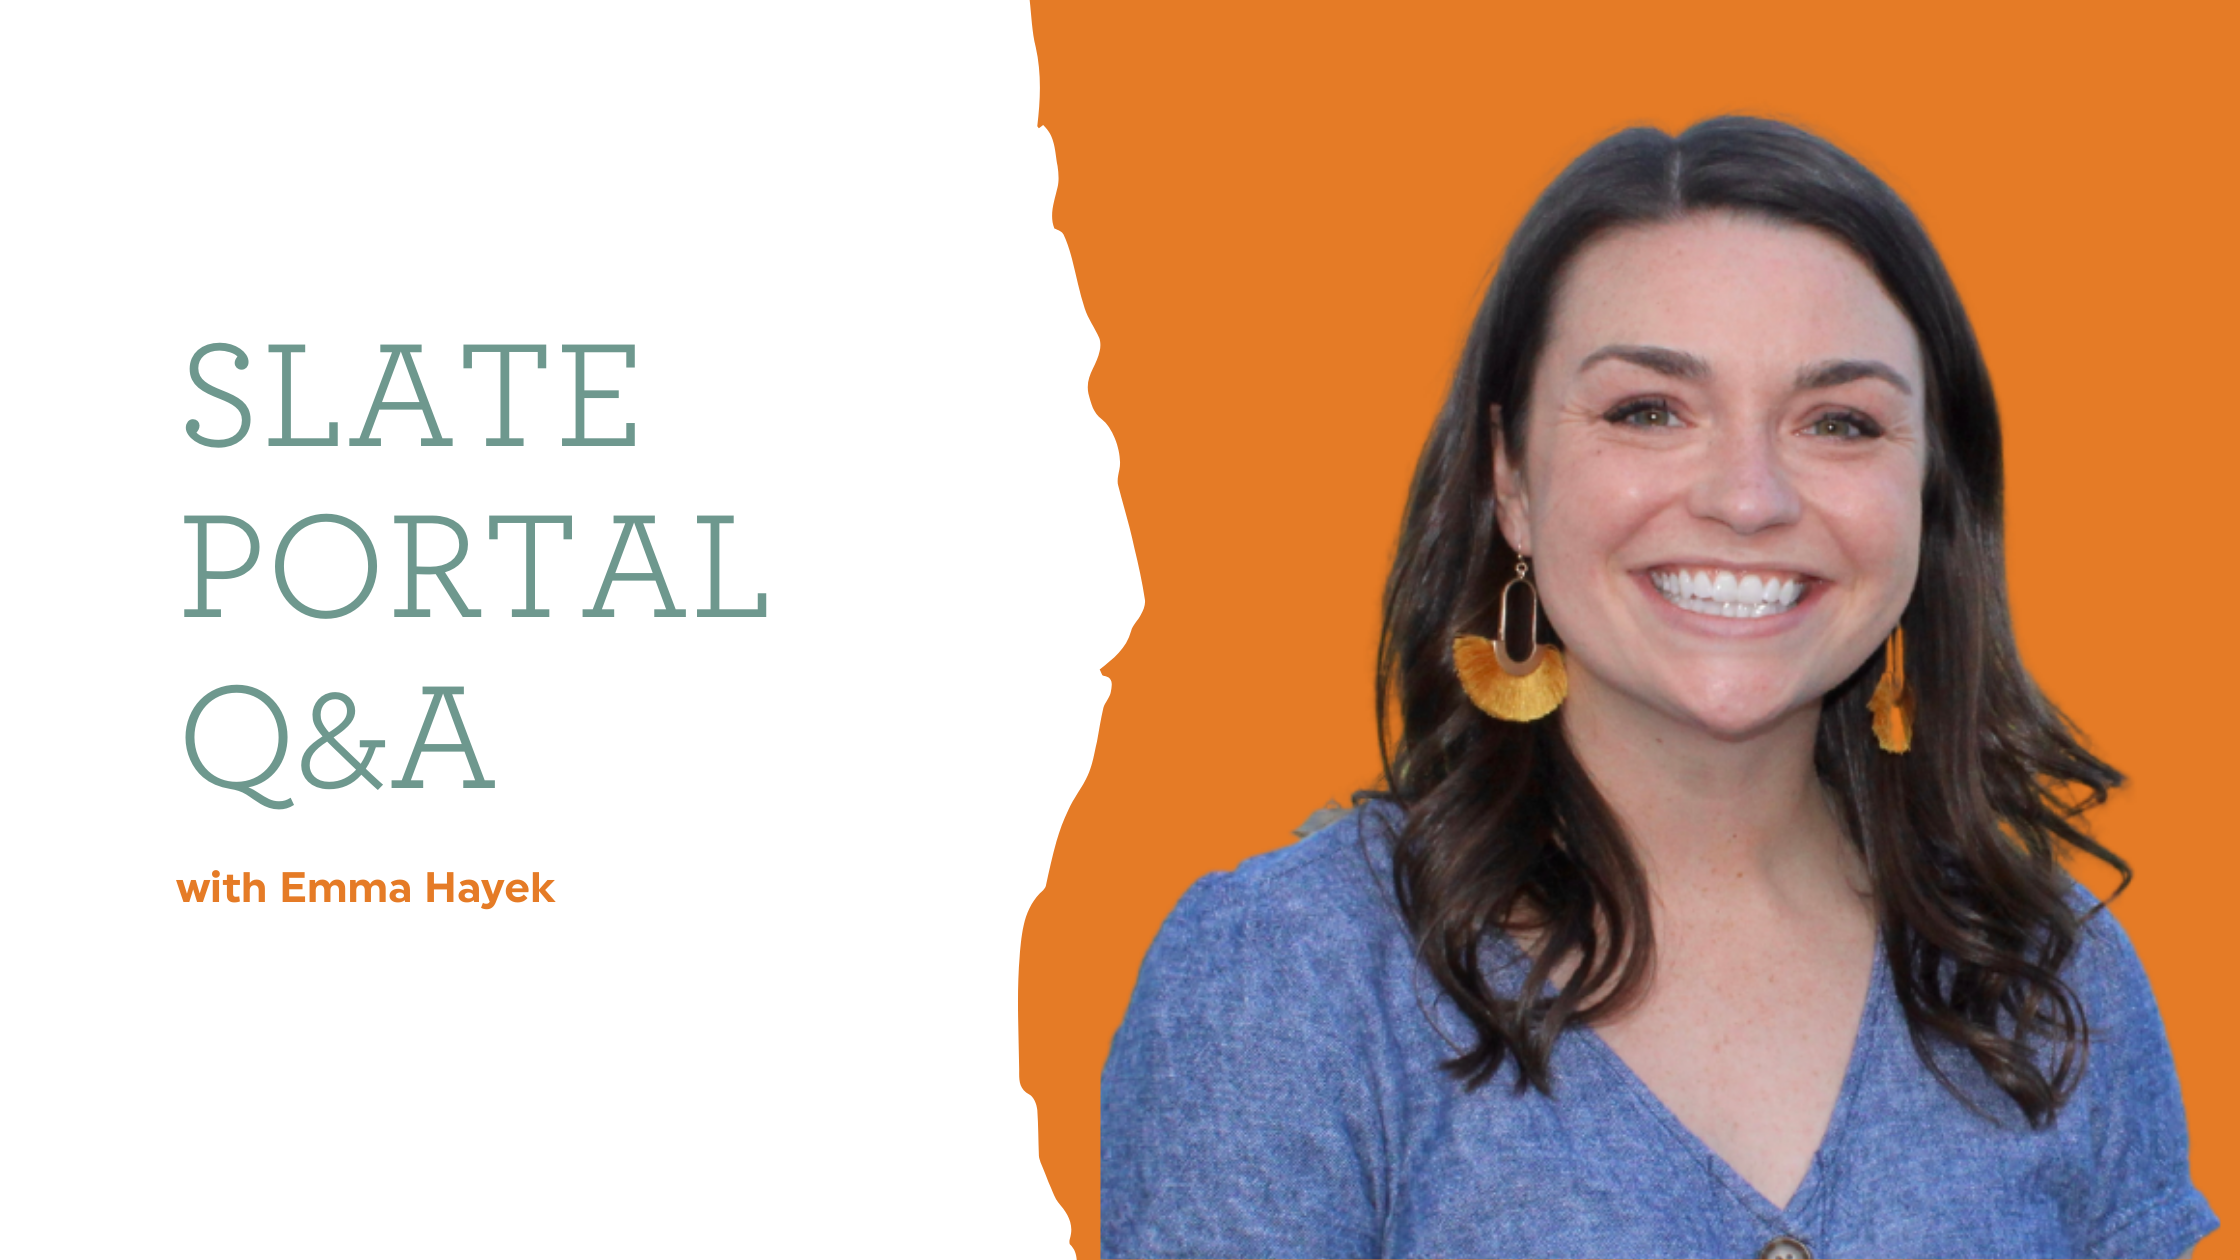 Slate Portal Q&A with Emma Hayek